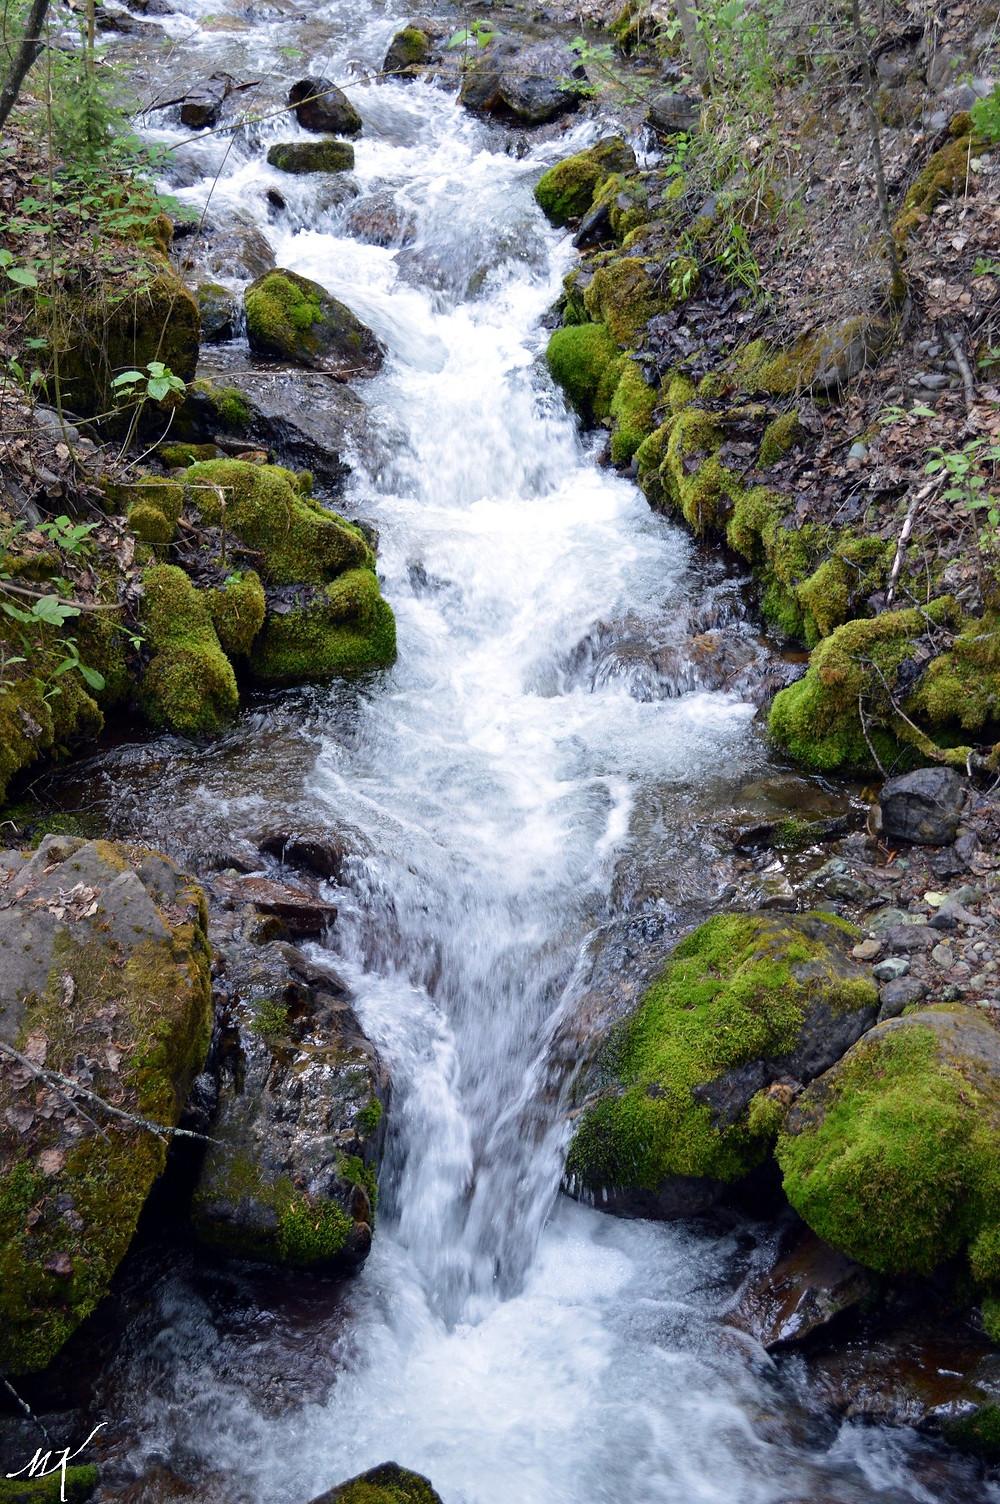 Waterfall Whitefish MK McClintock